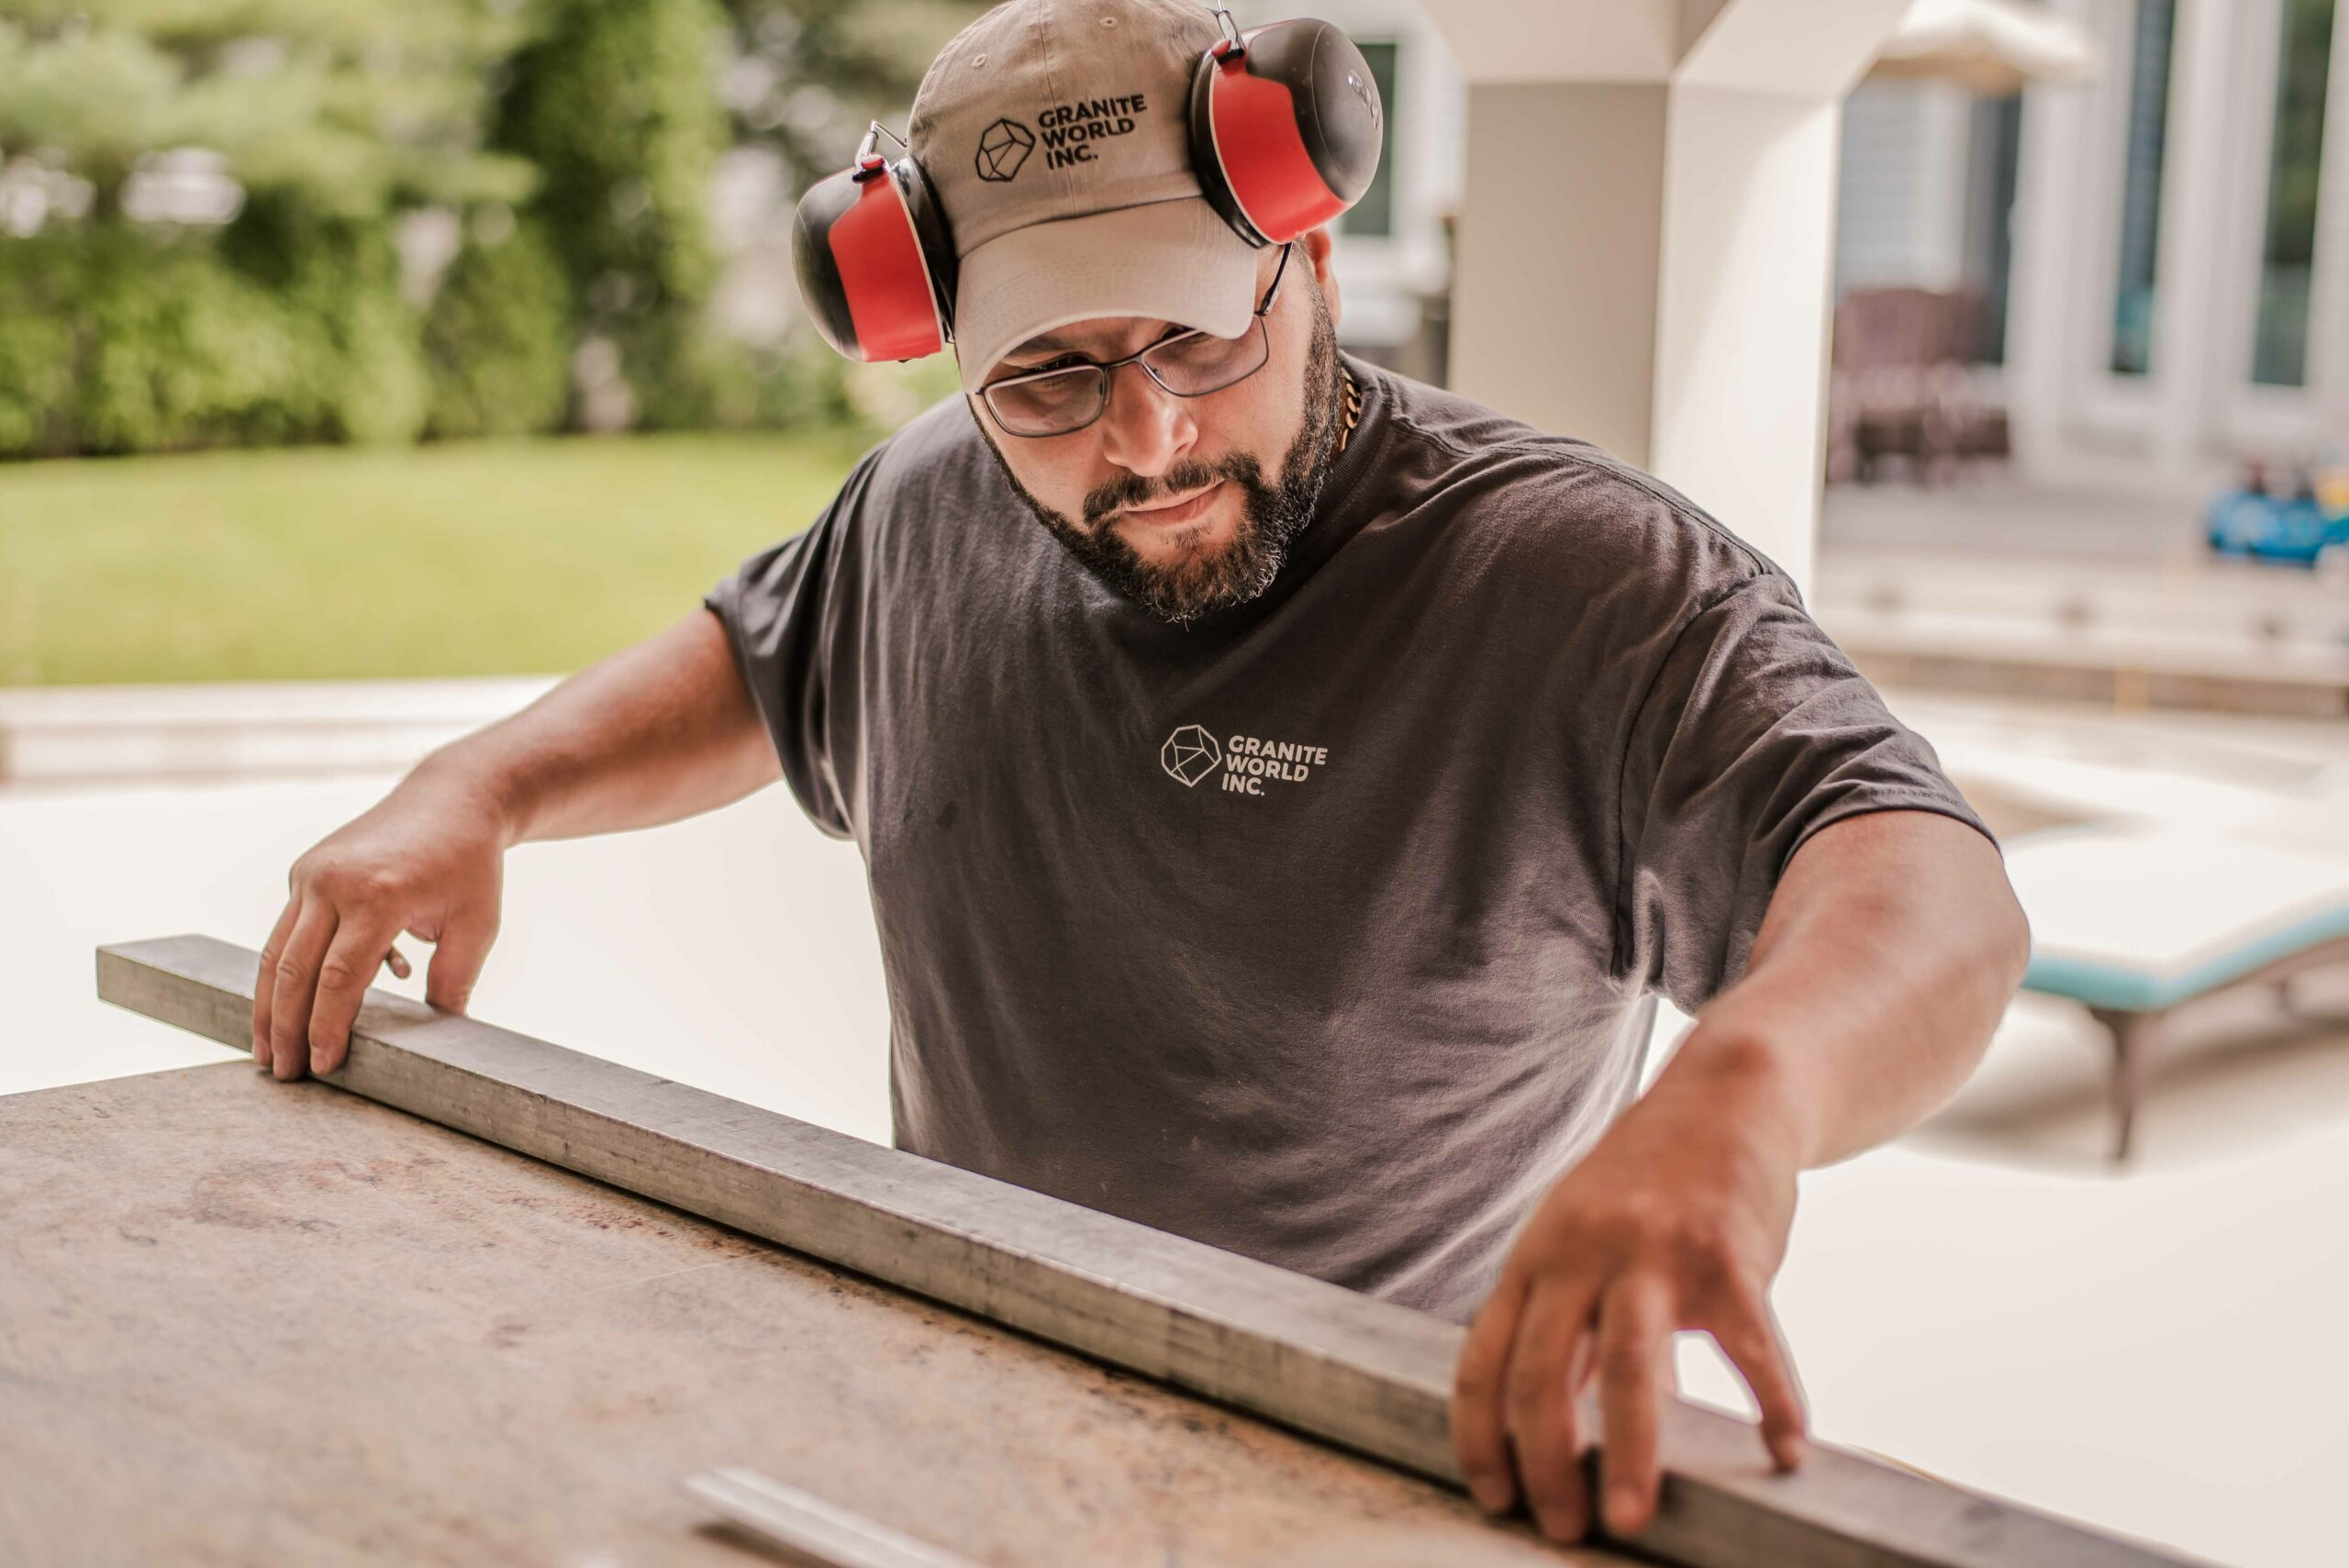 Granite World Employee Working on an outside countertop fabrication